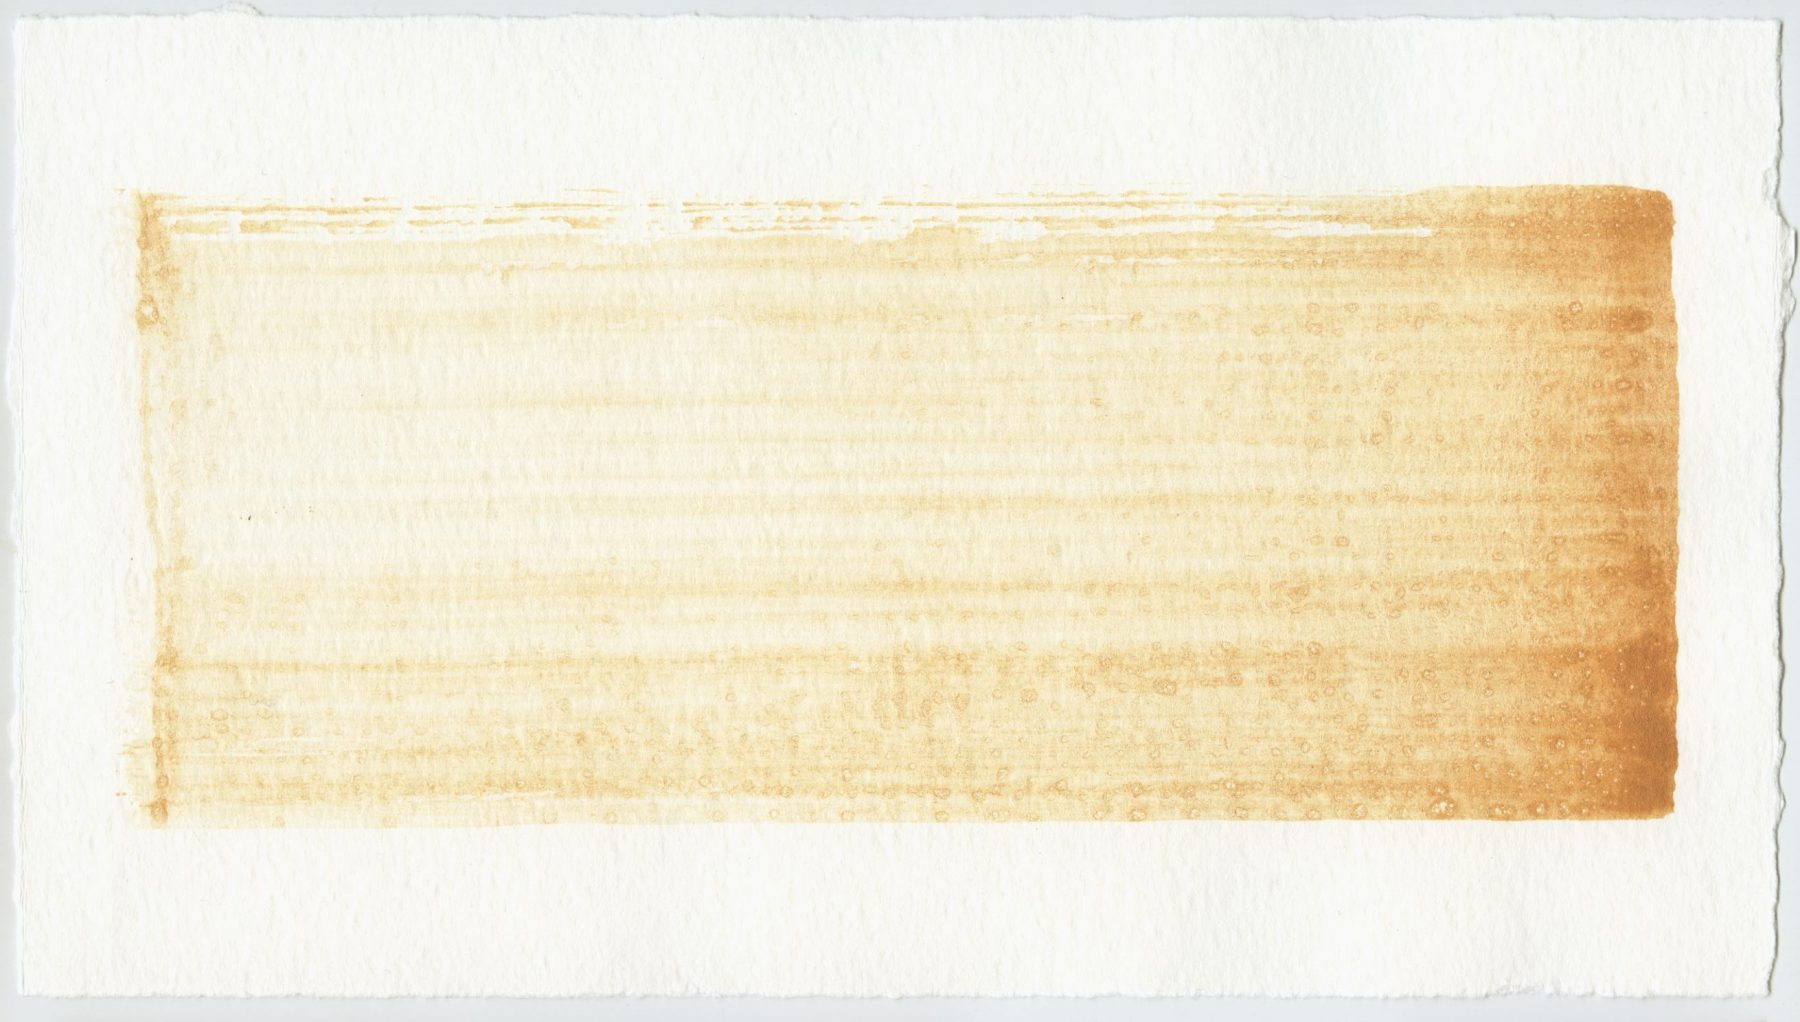 Brush stroke no. 98 - Selfmade pigment: Perekker roze